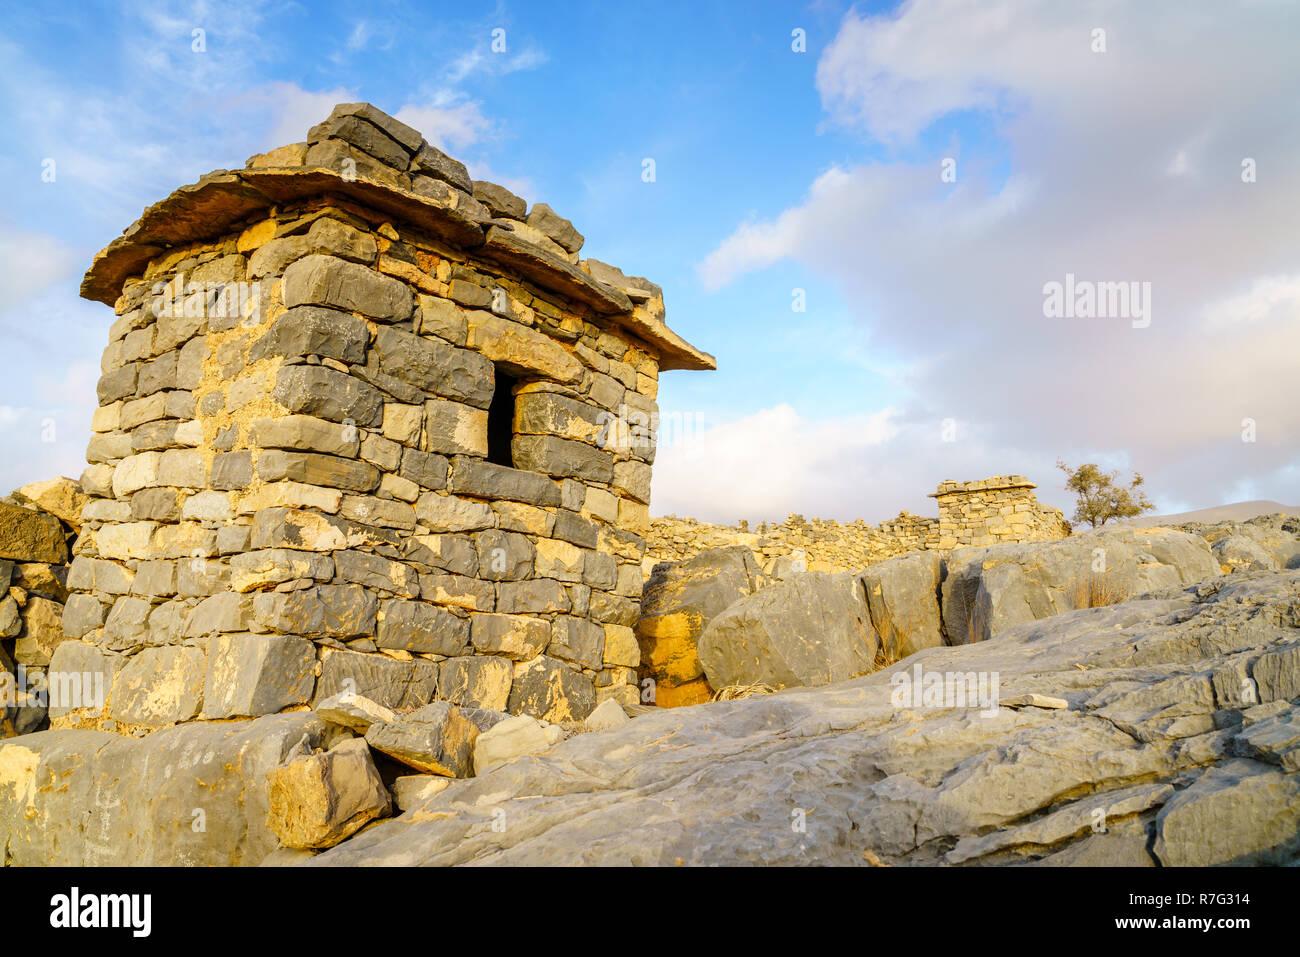 Stone shelter in an abandoned village in Hajar mountains of Ras Al Khaimah, UAE - Stock Image